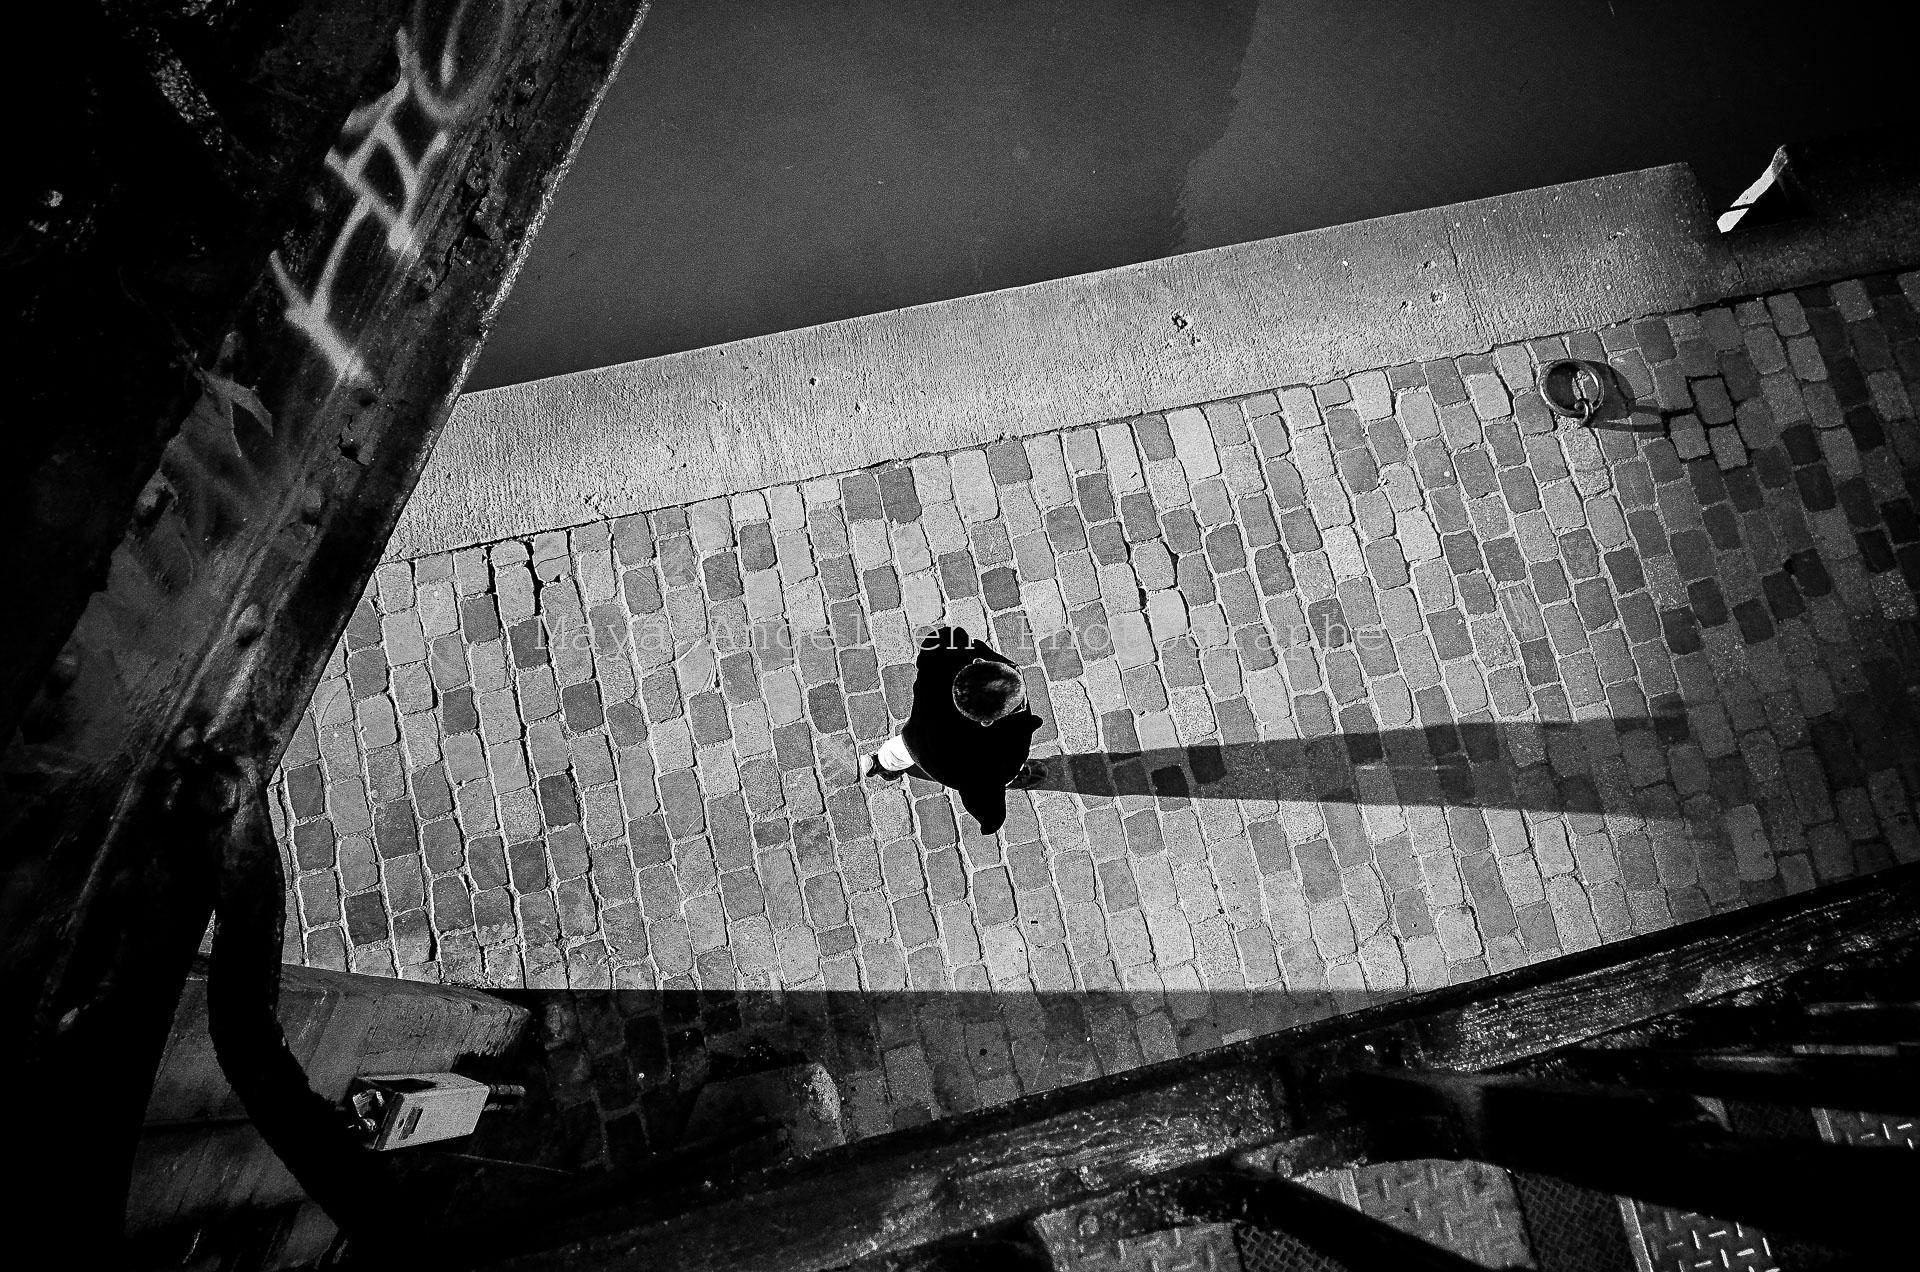 Photographe-streetphoto-maya-angelsen-agent-007